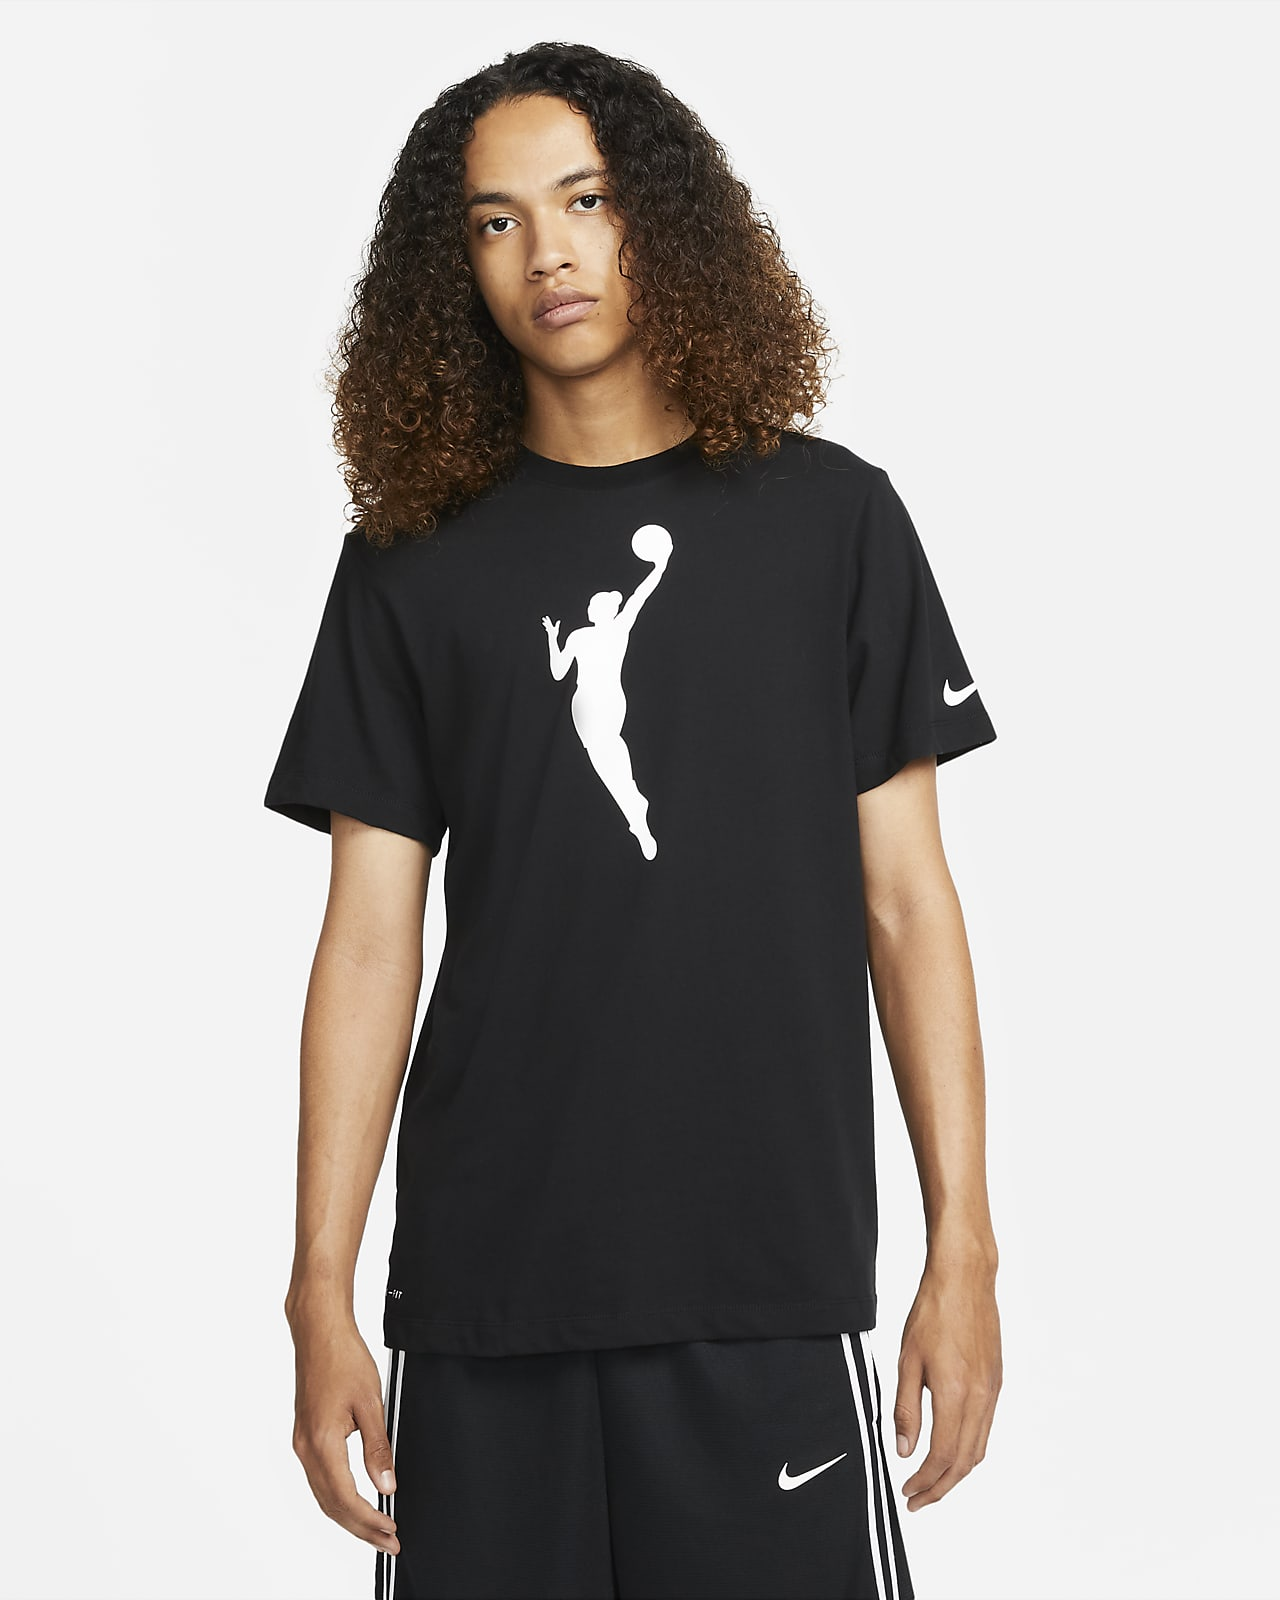 WNBA Logo Nike Short-Sleeve T-Shirt